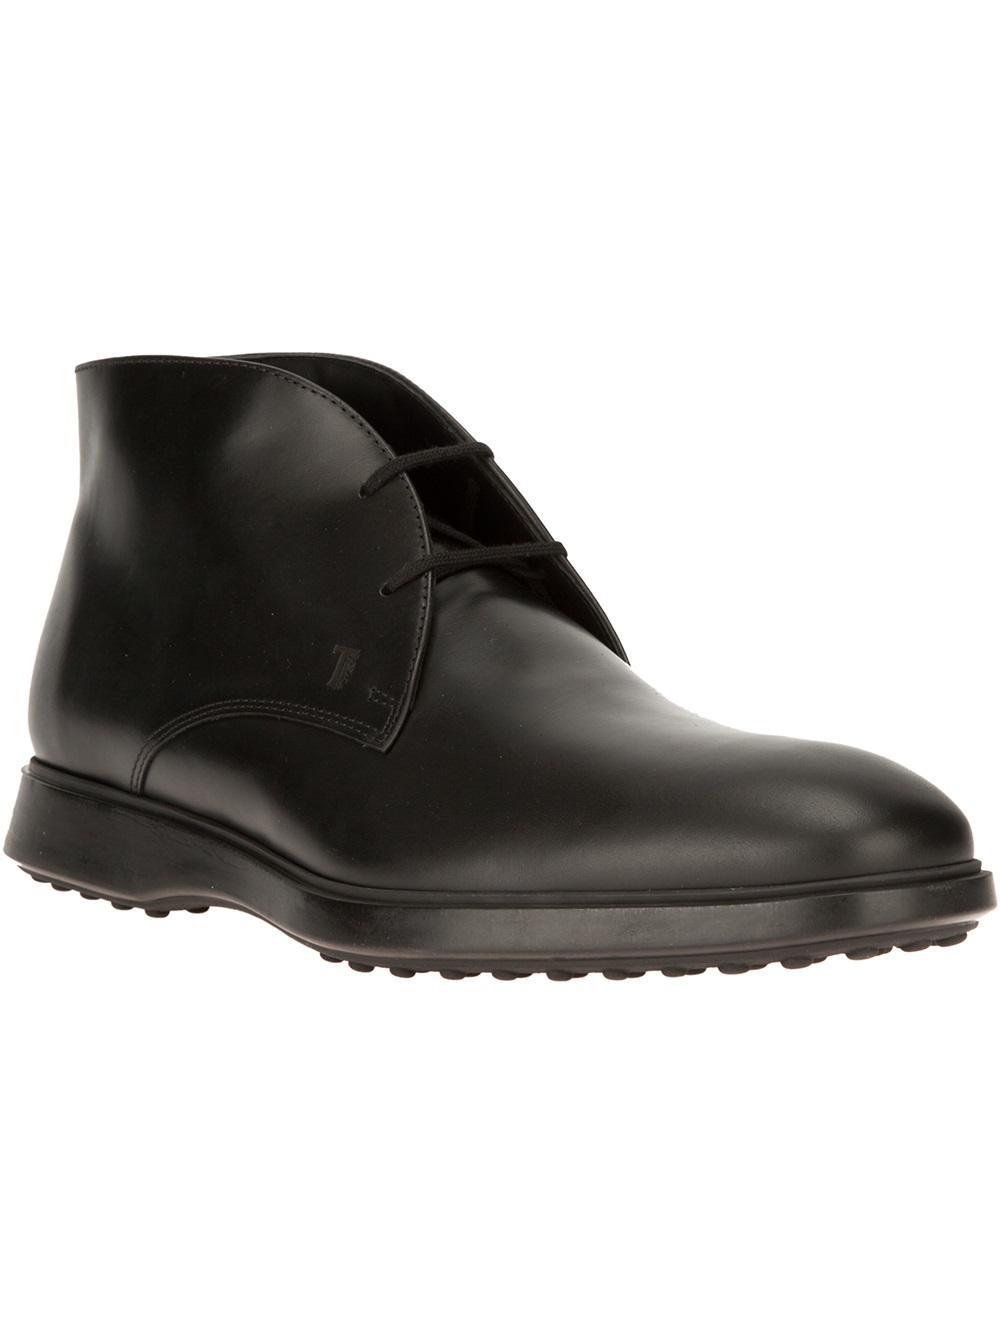 tod 39 s desert boot in black for men lyst. Black Bedroom Furniture Sets. Home Design Ideas